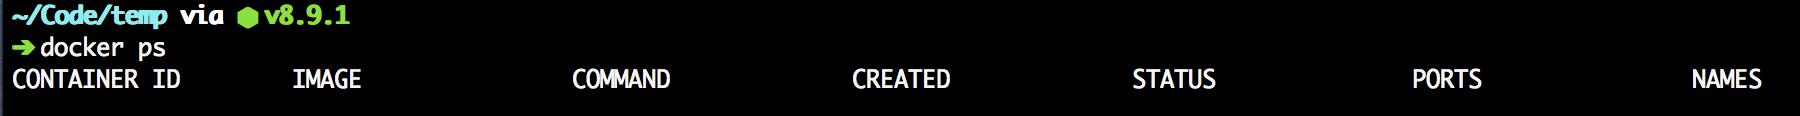 docker ps empty screenshot